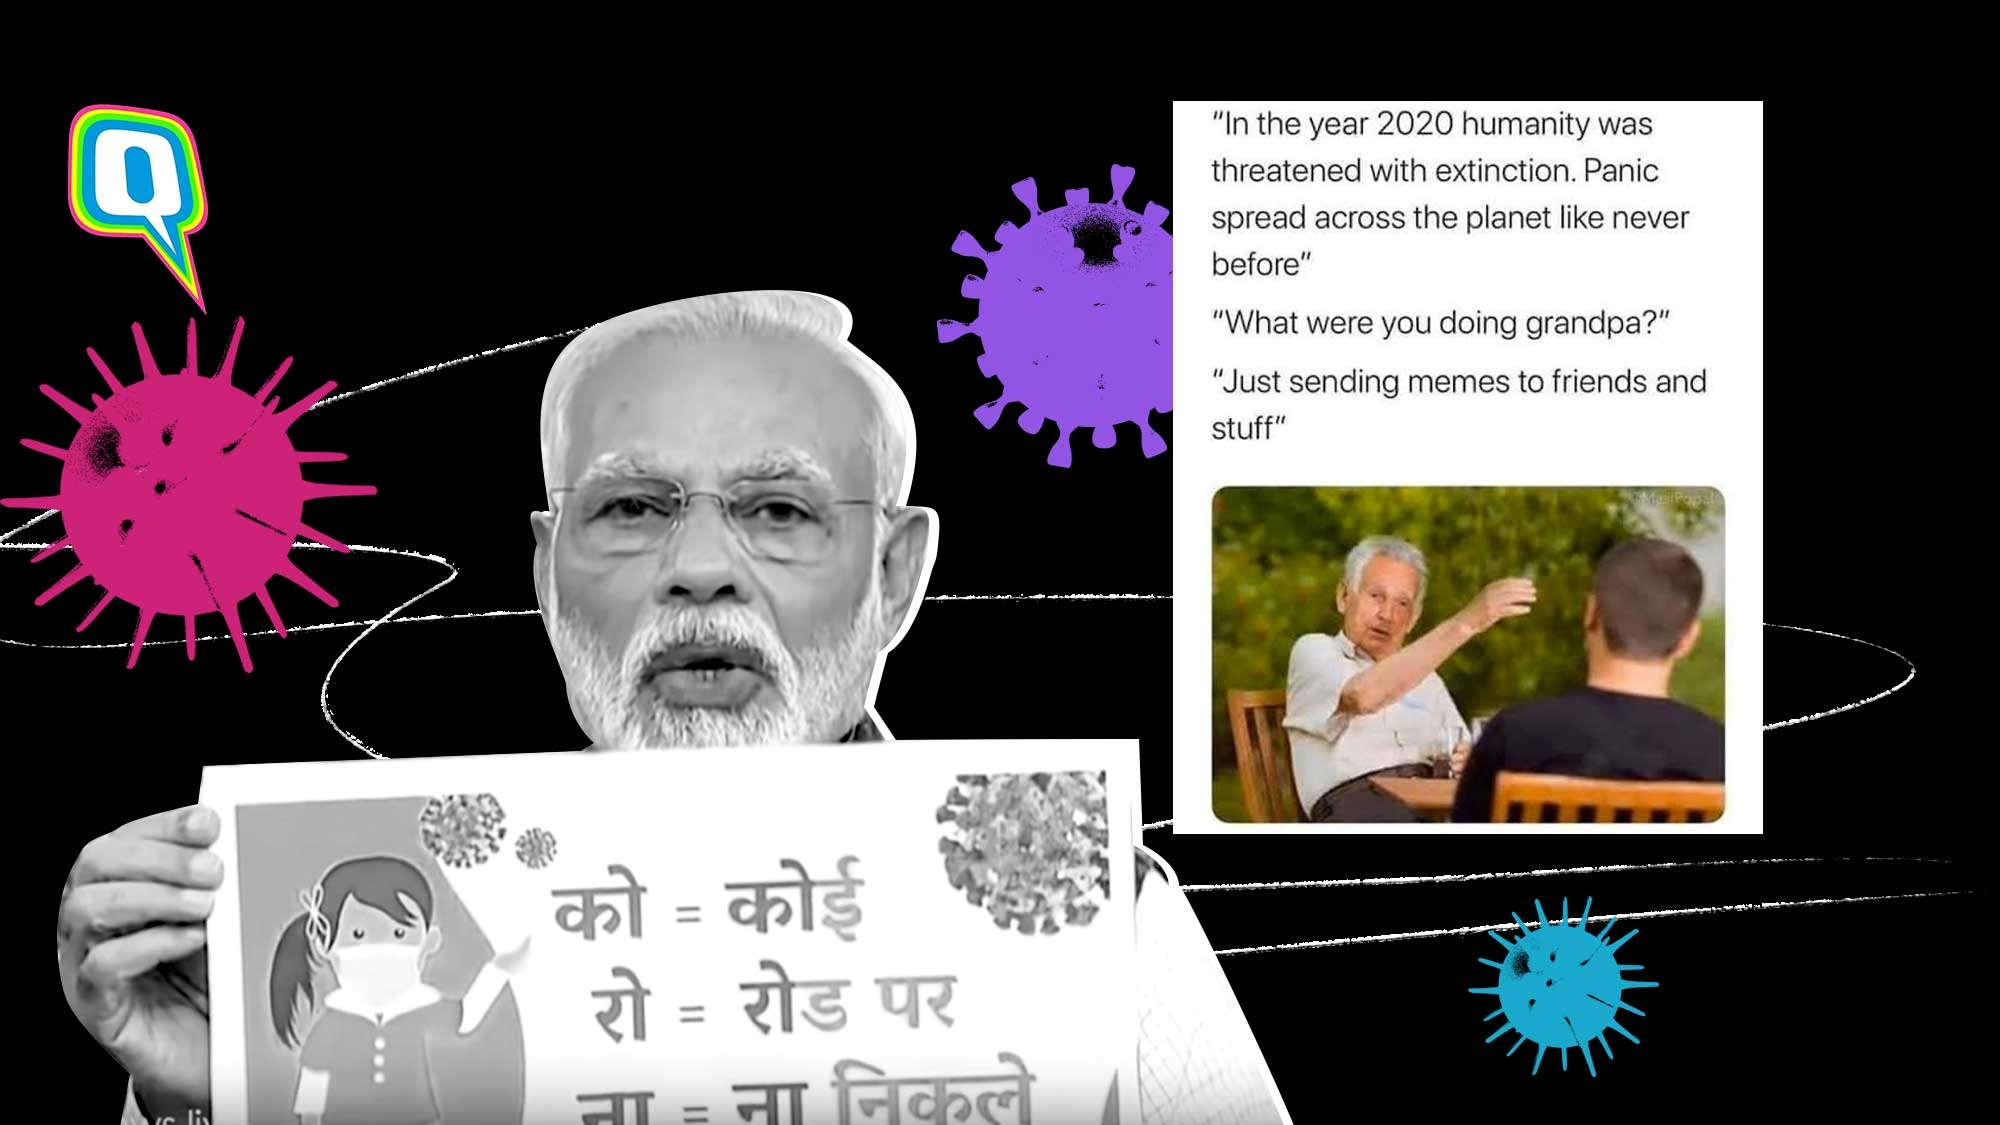 Coronavirus India Memes Covid 19 Memes Are Helping People Cope